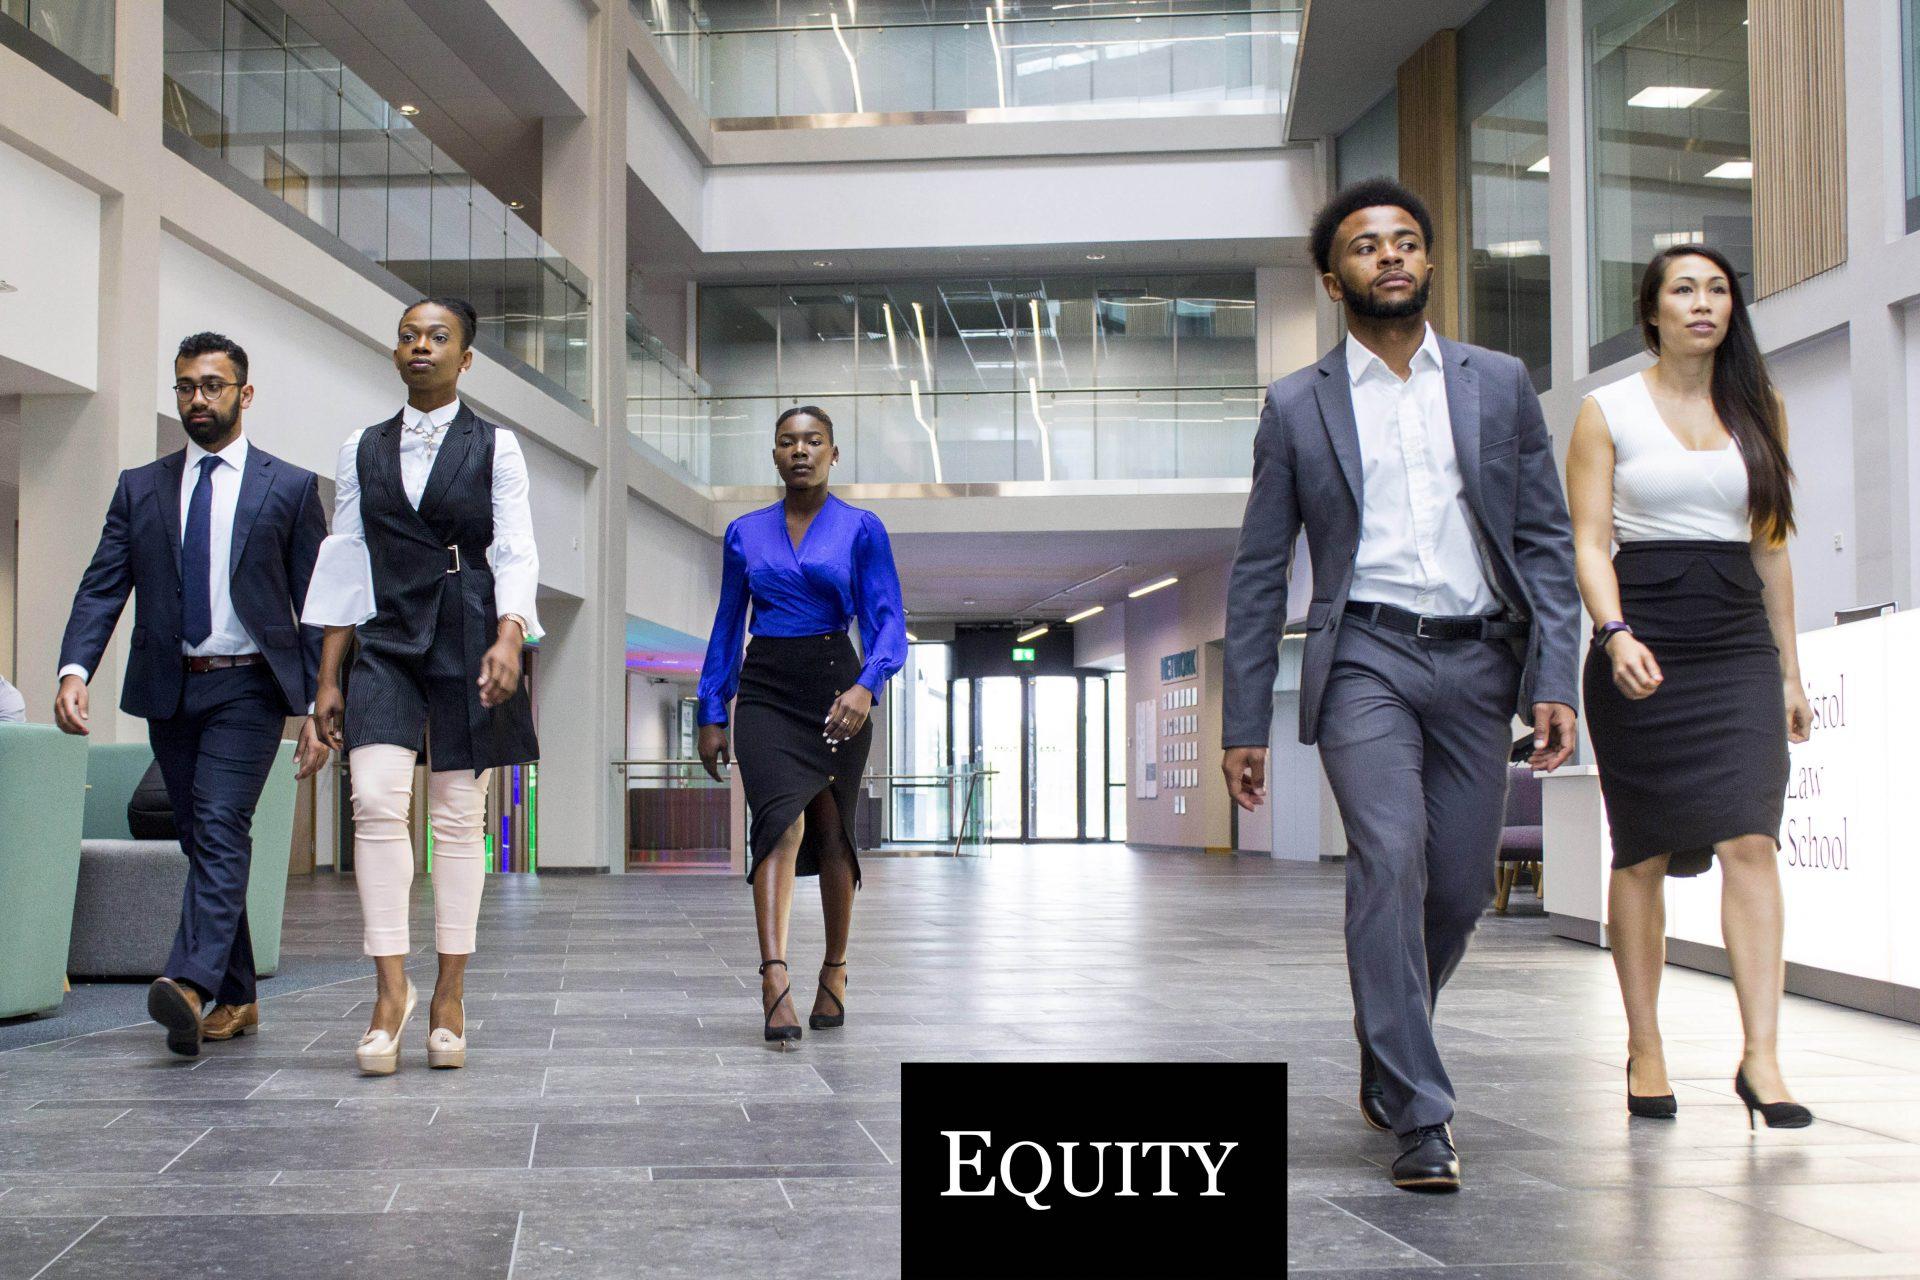 IMG_7985 - Equity